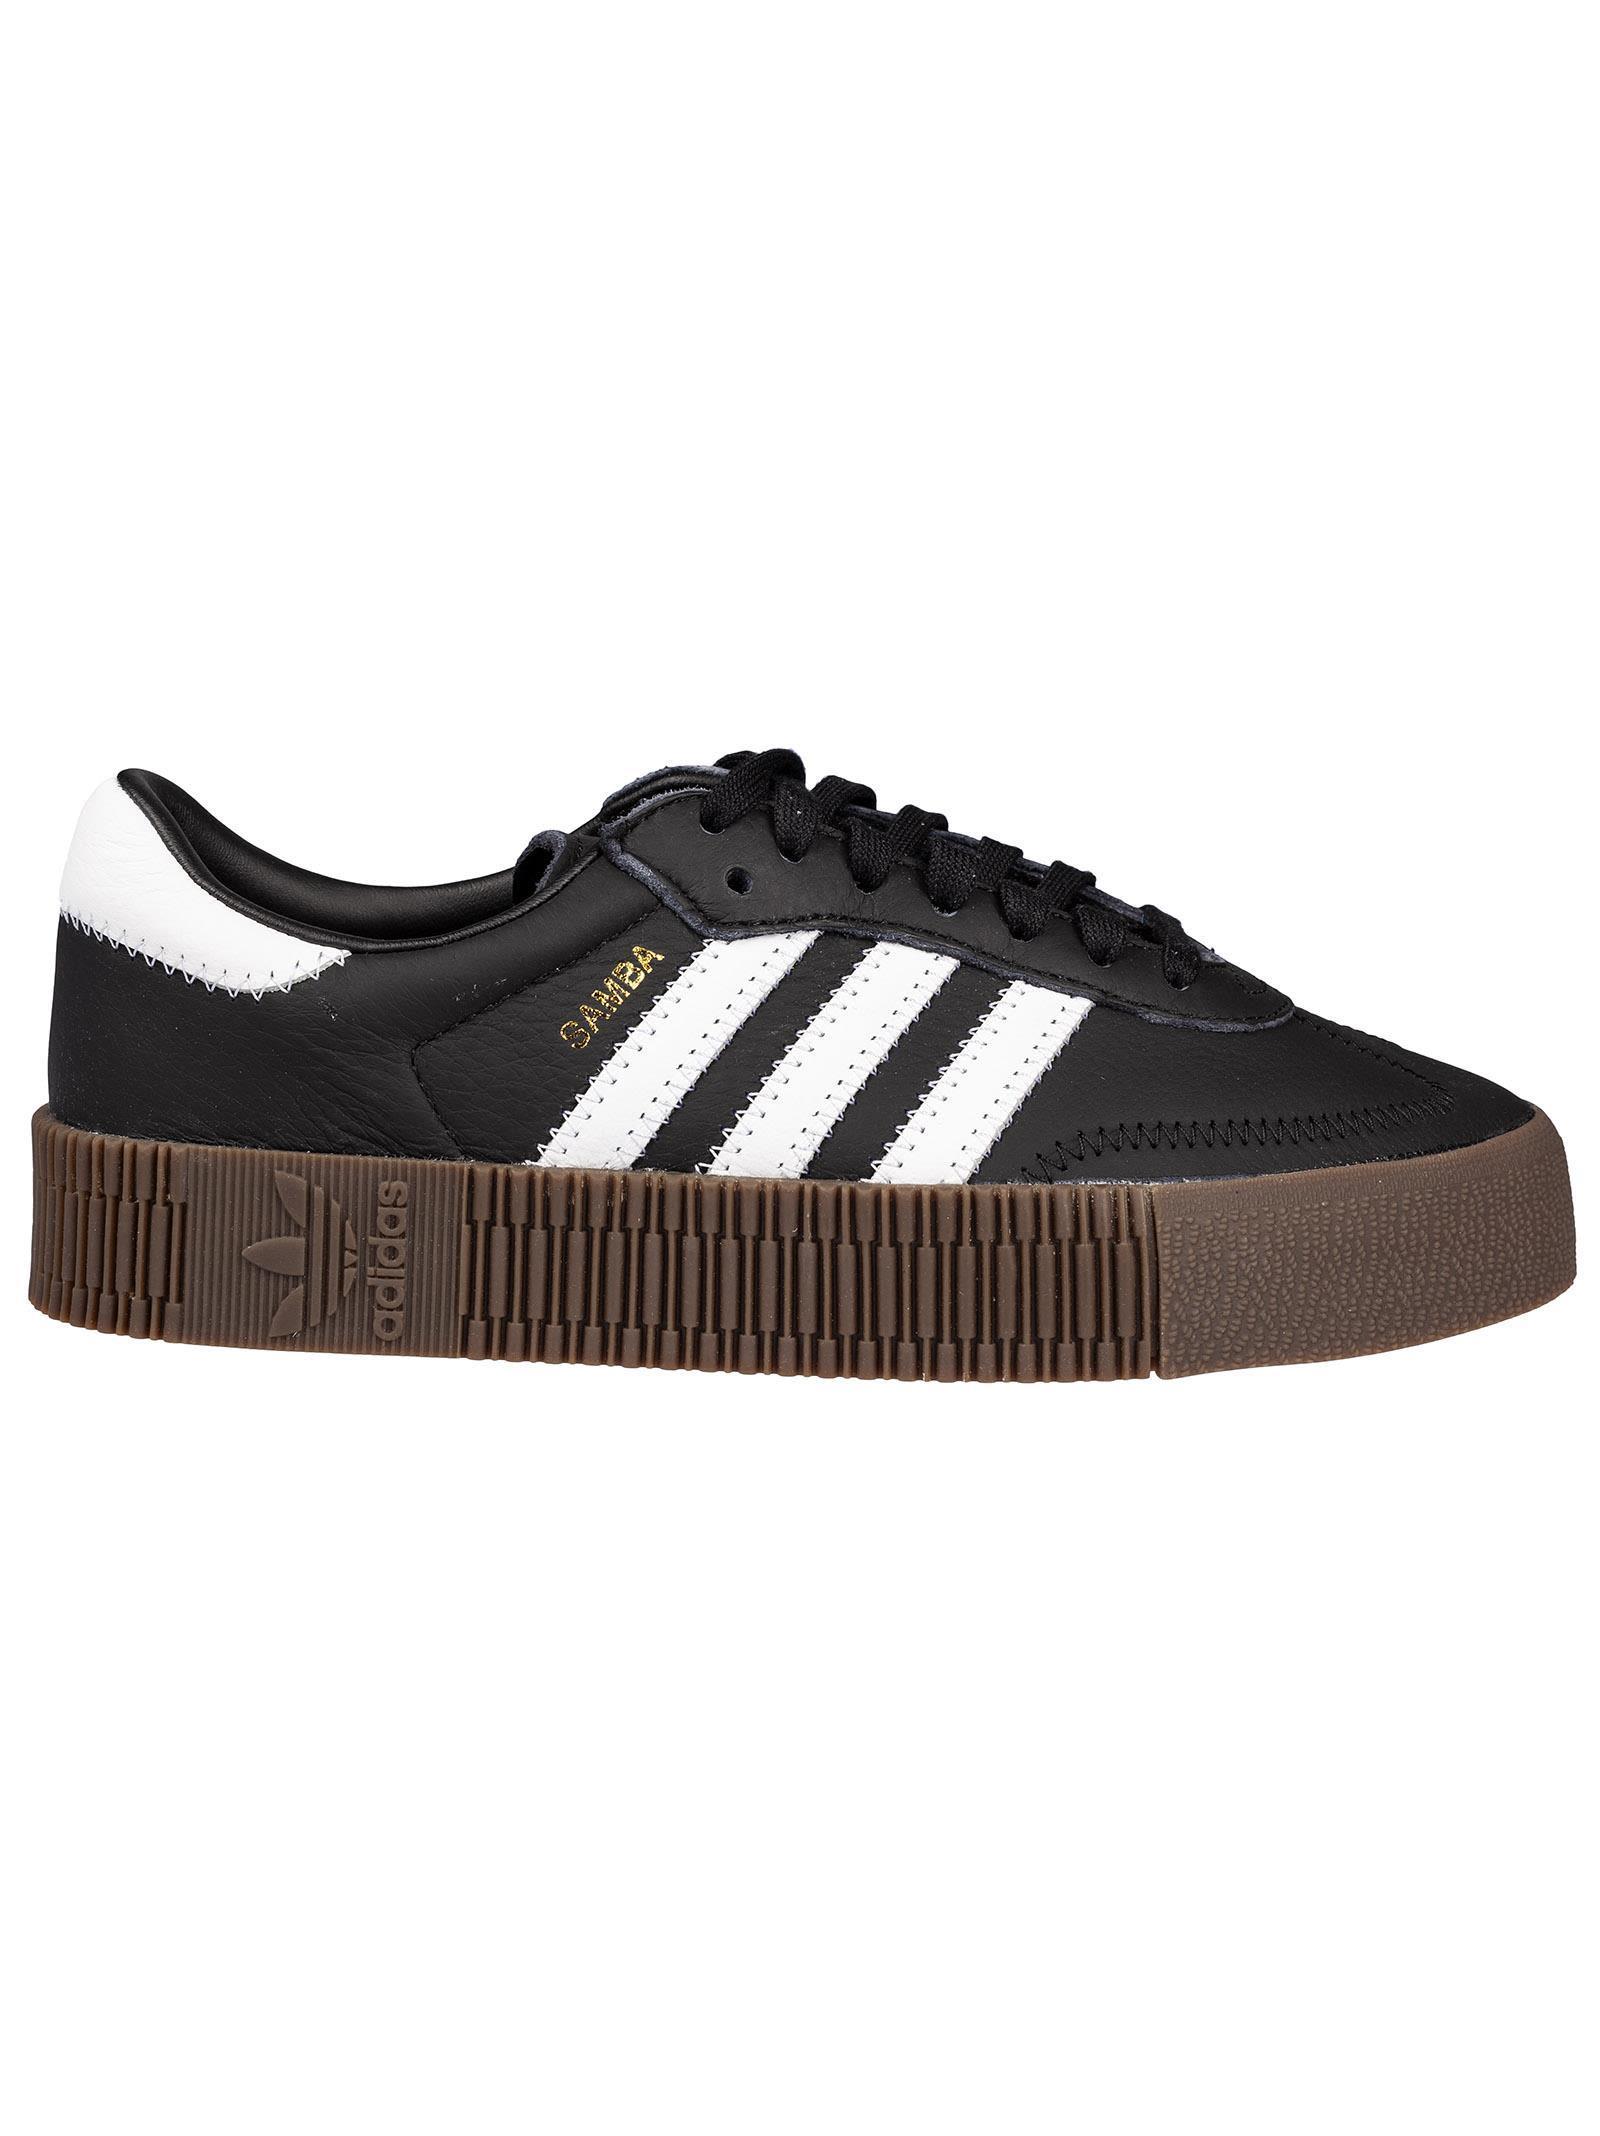 online store cc268 0ebf2 Adidas Originals Samba Rose Sneakers In Black With Dark Gum Sole - Black